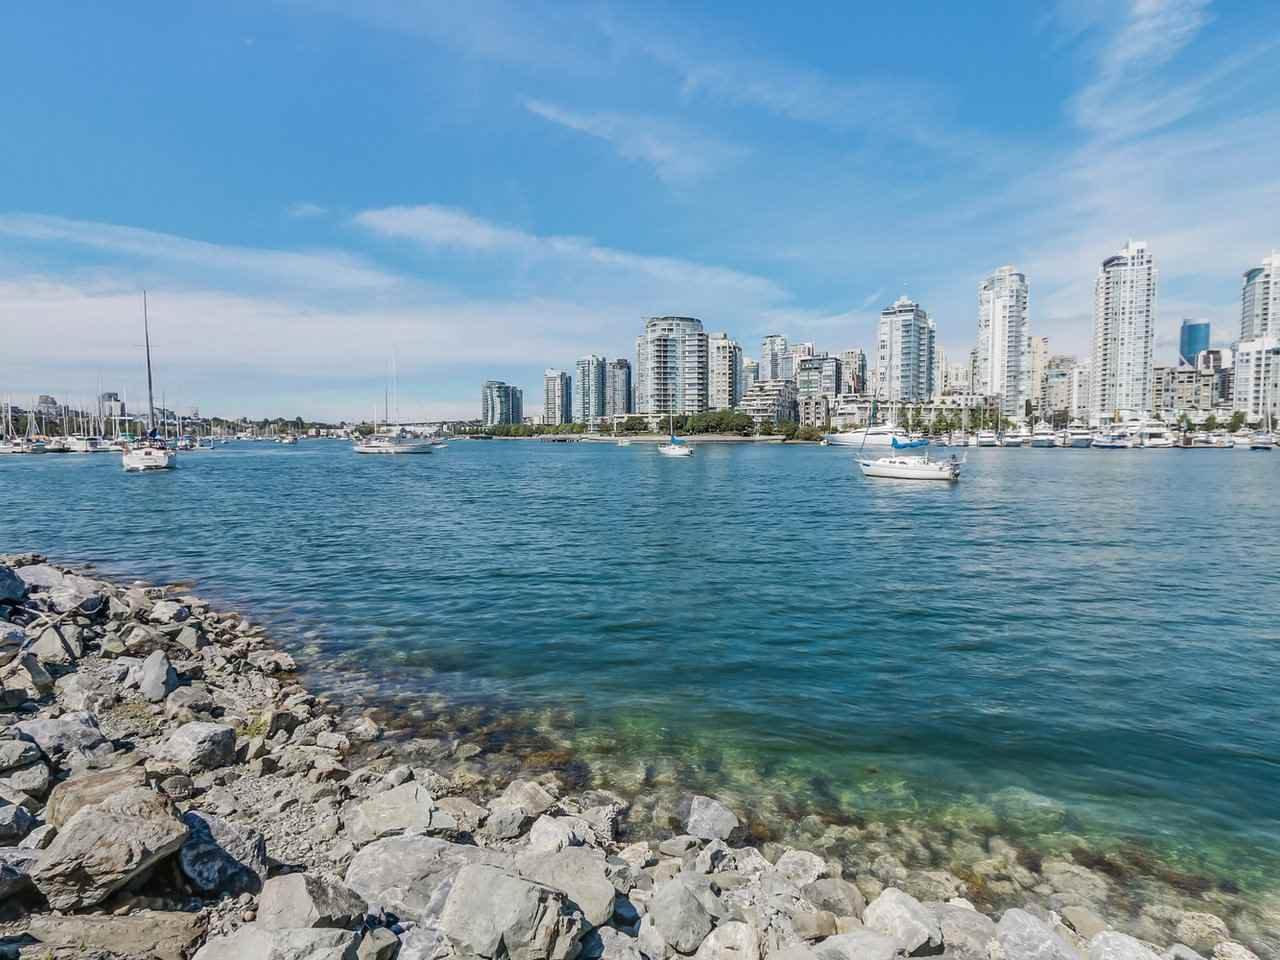 "Main Photo: 116 1859 SPYGLASS Place in Vancouver: False Creek Condo for sale in ""REGATTA"" (Vancouver West)  : MLS®# R2181553"